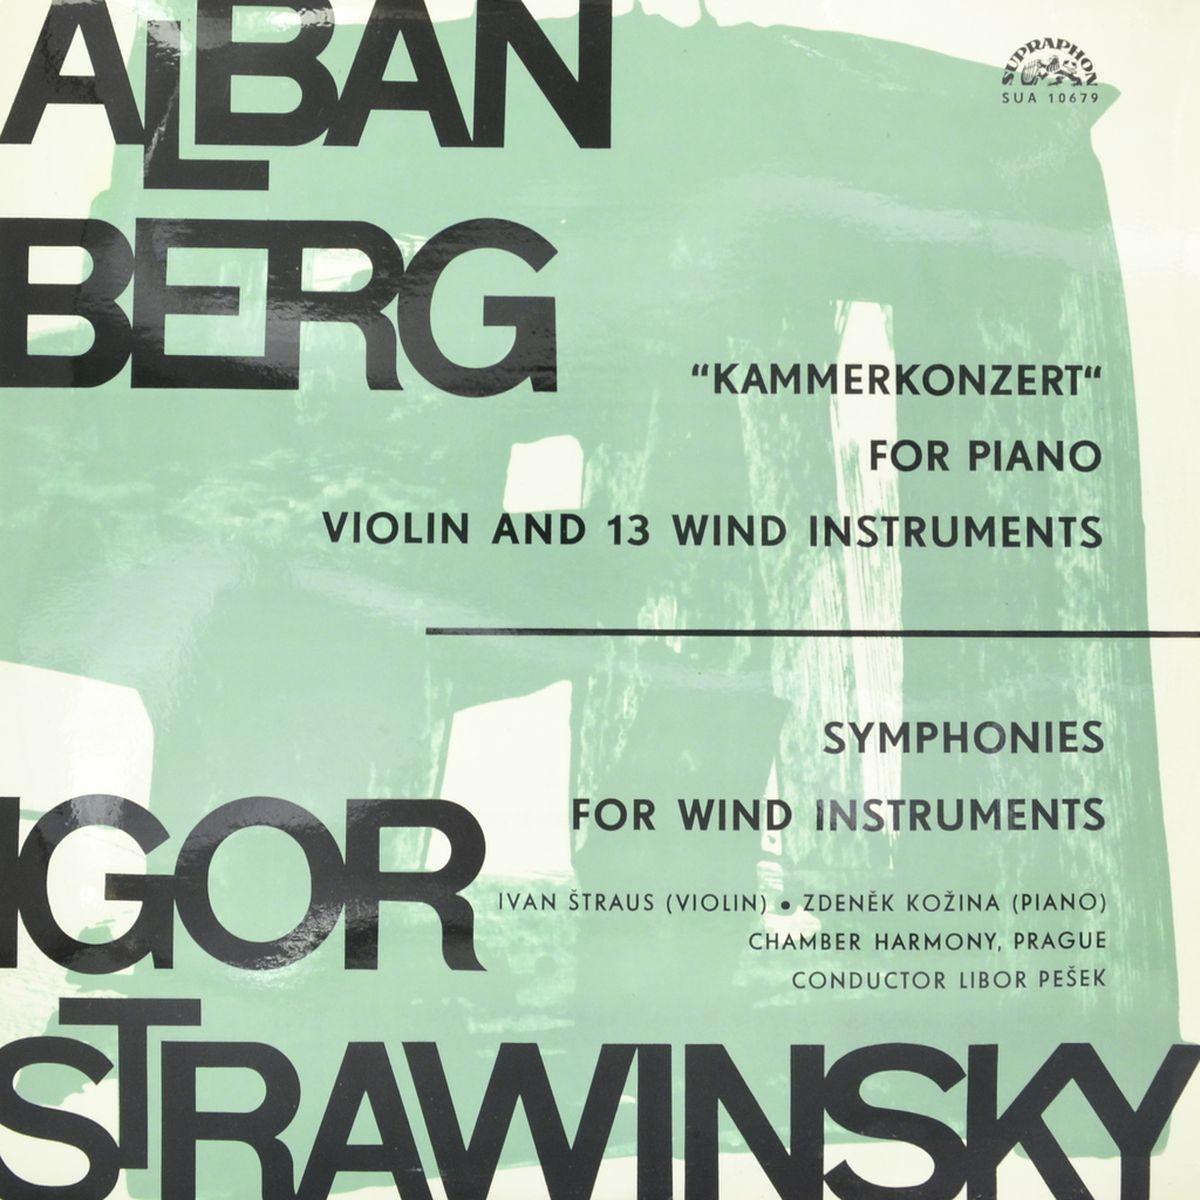 Alban Berg, Igor Stravinsky, Ivan Straus - Kammerkonzert For Piano, Violin And 13 Wind Instruments / Symphonies For Wind Instruments (LP)